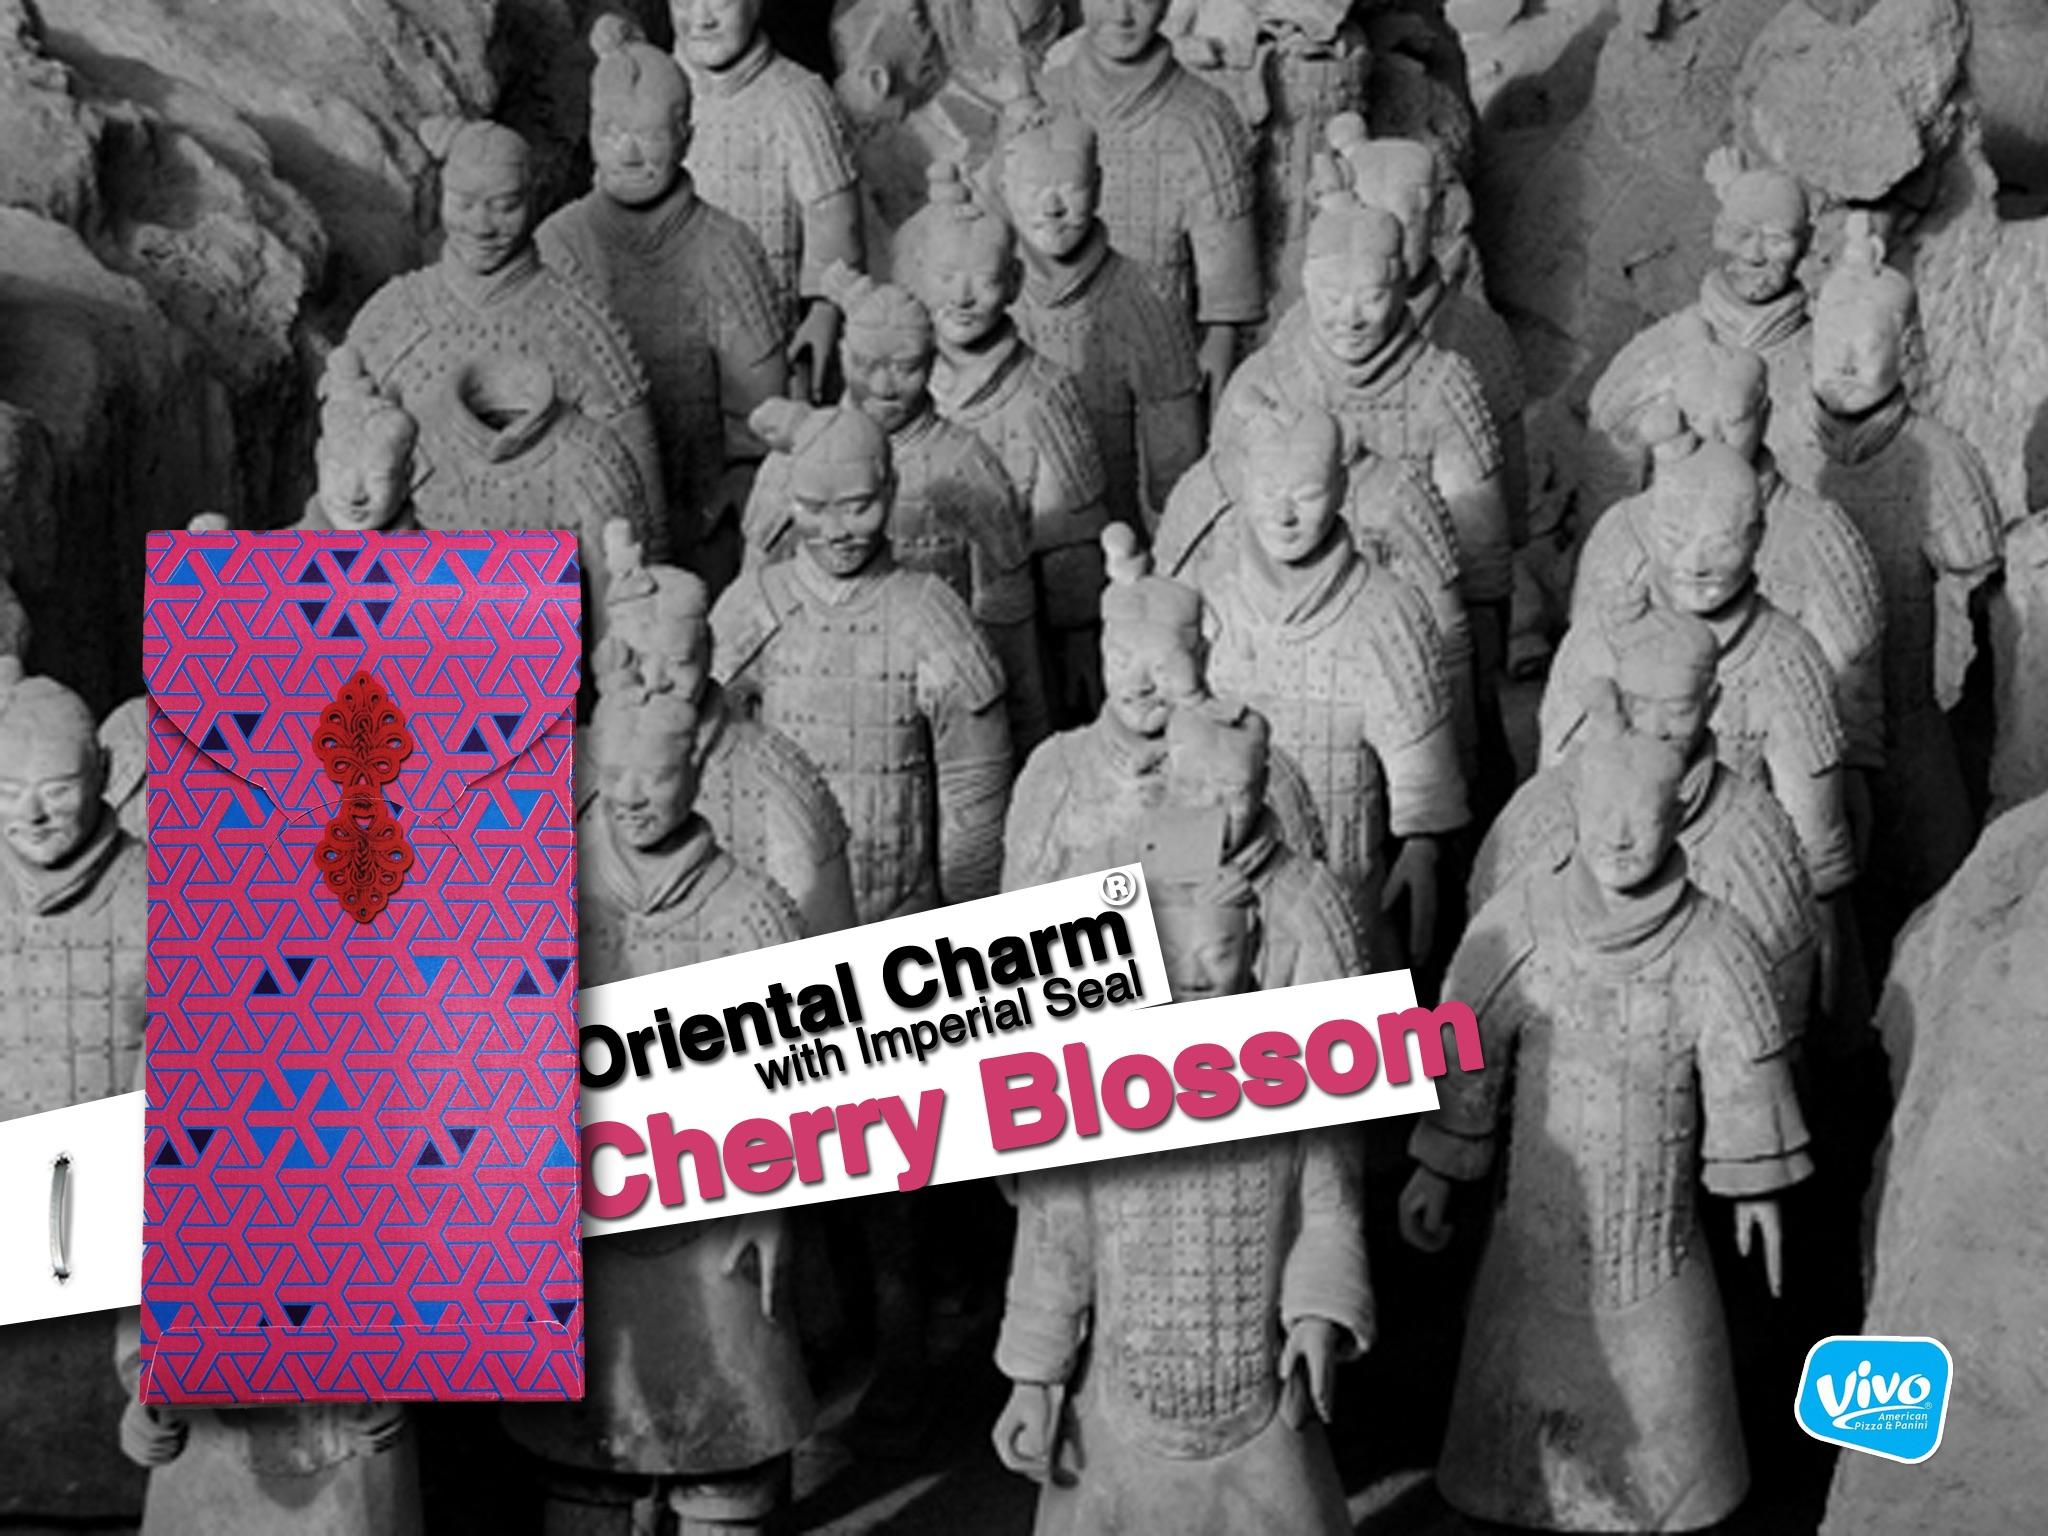 Oriental Charm Cherry Blossom